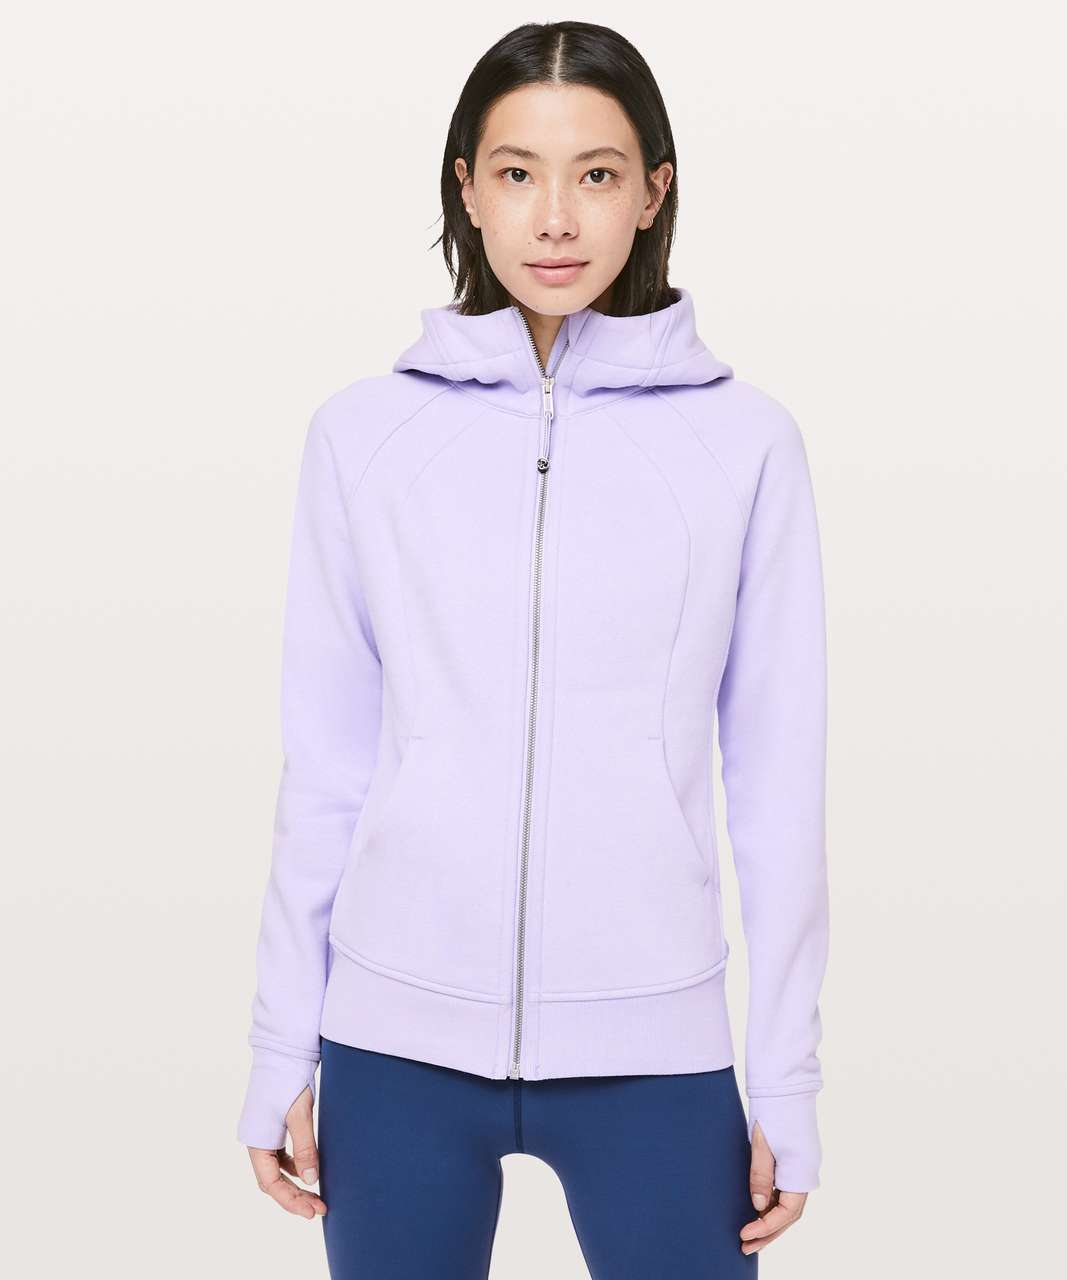 Lululemon Scuba Hoodie *Light Cotton Fleece - Sheer Violet